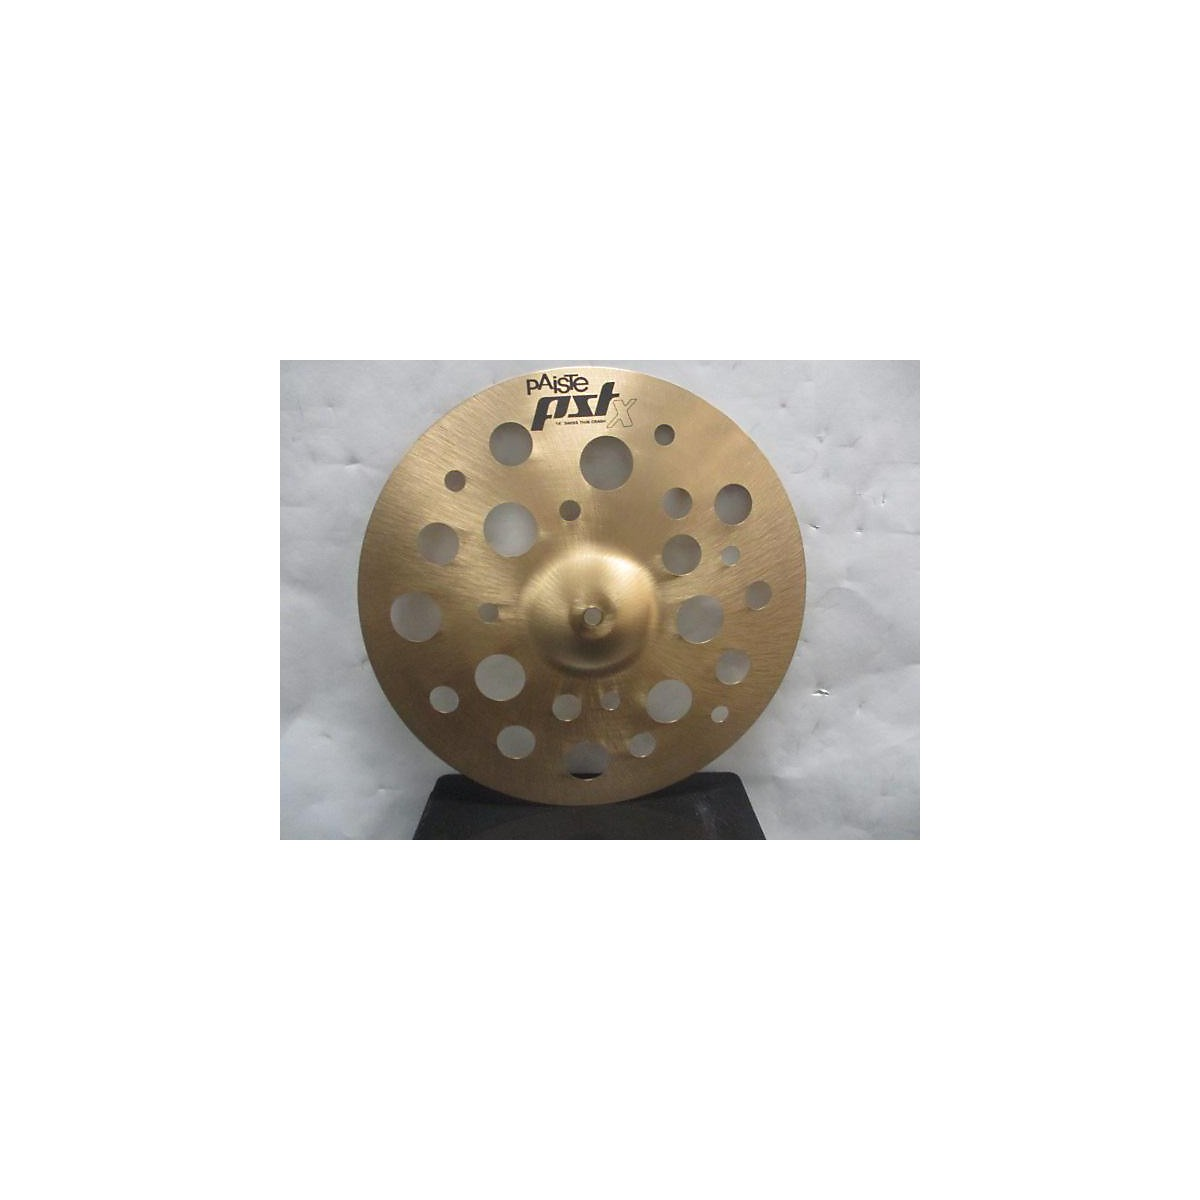 Paiste 14in PSTX SWISS THIN CRASH Cymbal